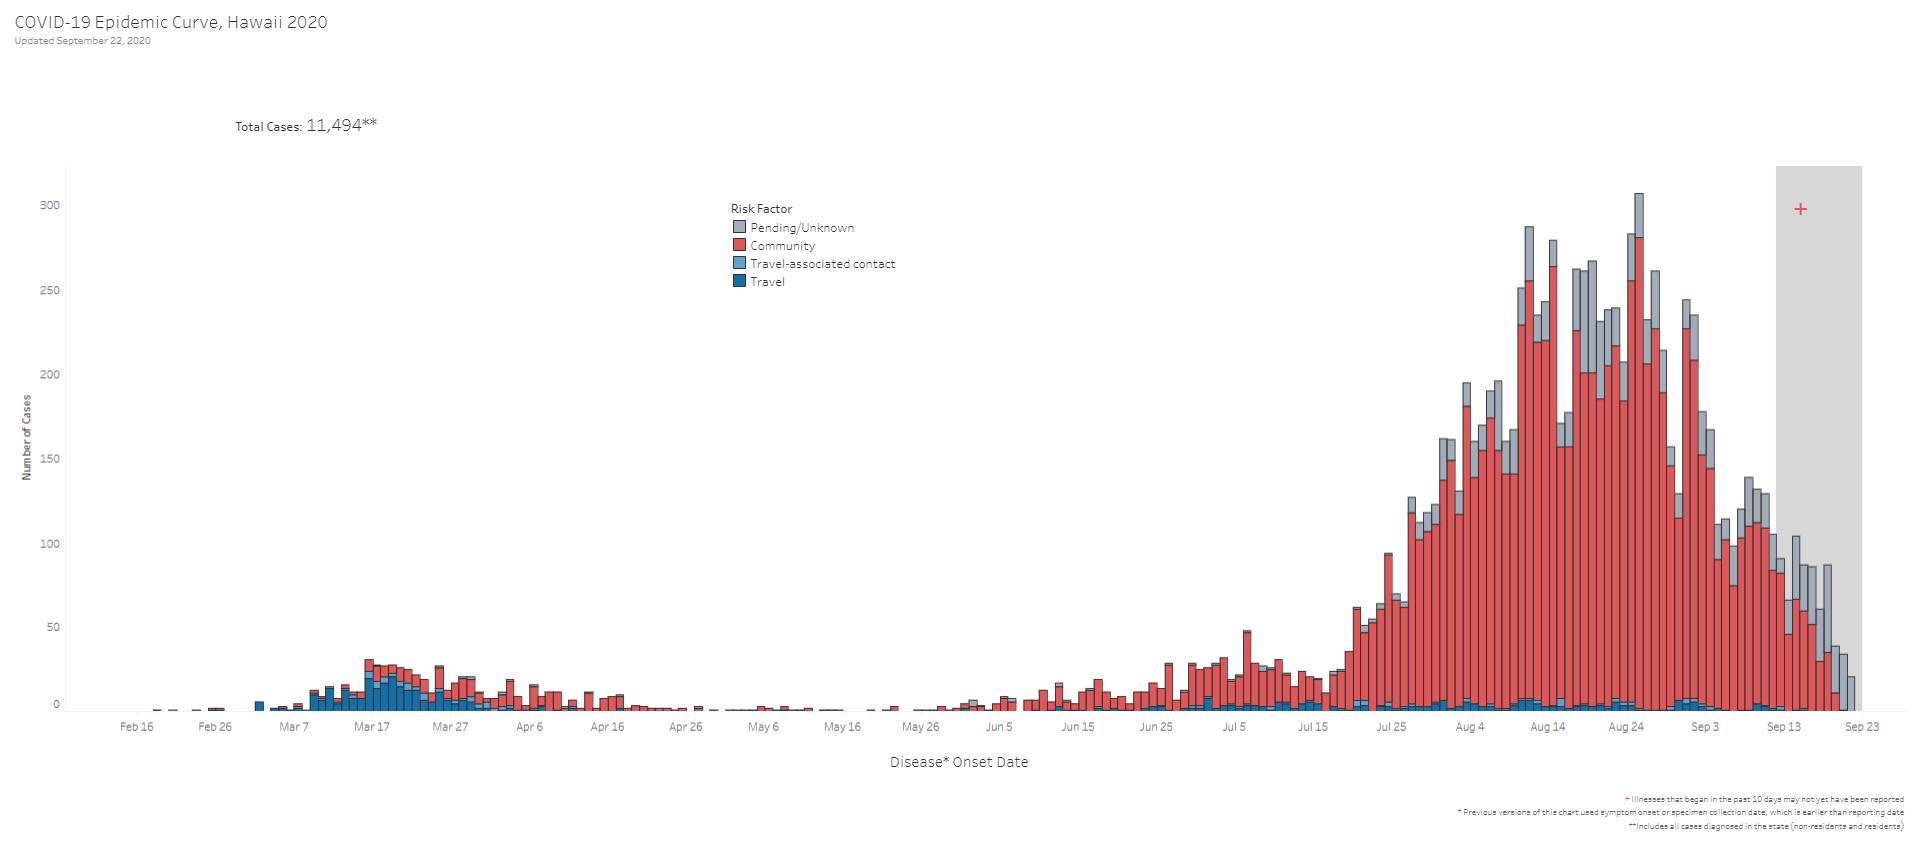 COVID-19 Epidemic Curve Hawaii September 22, 2020